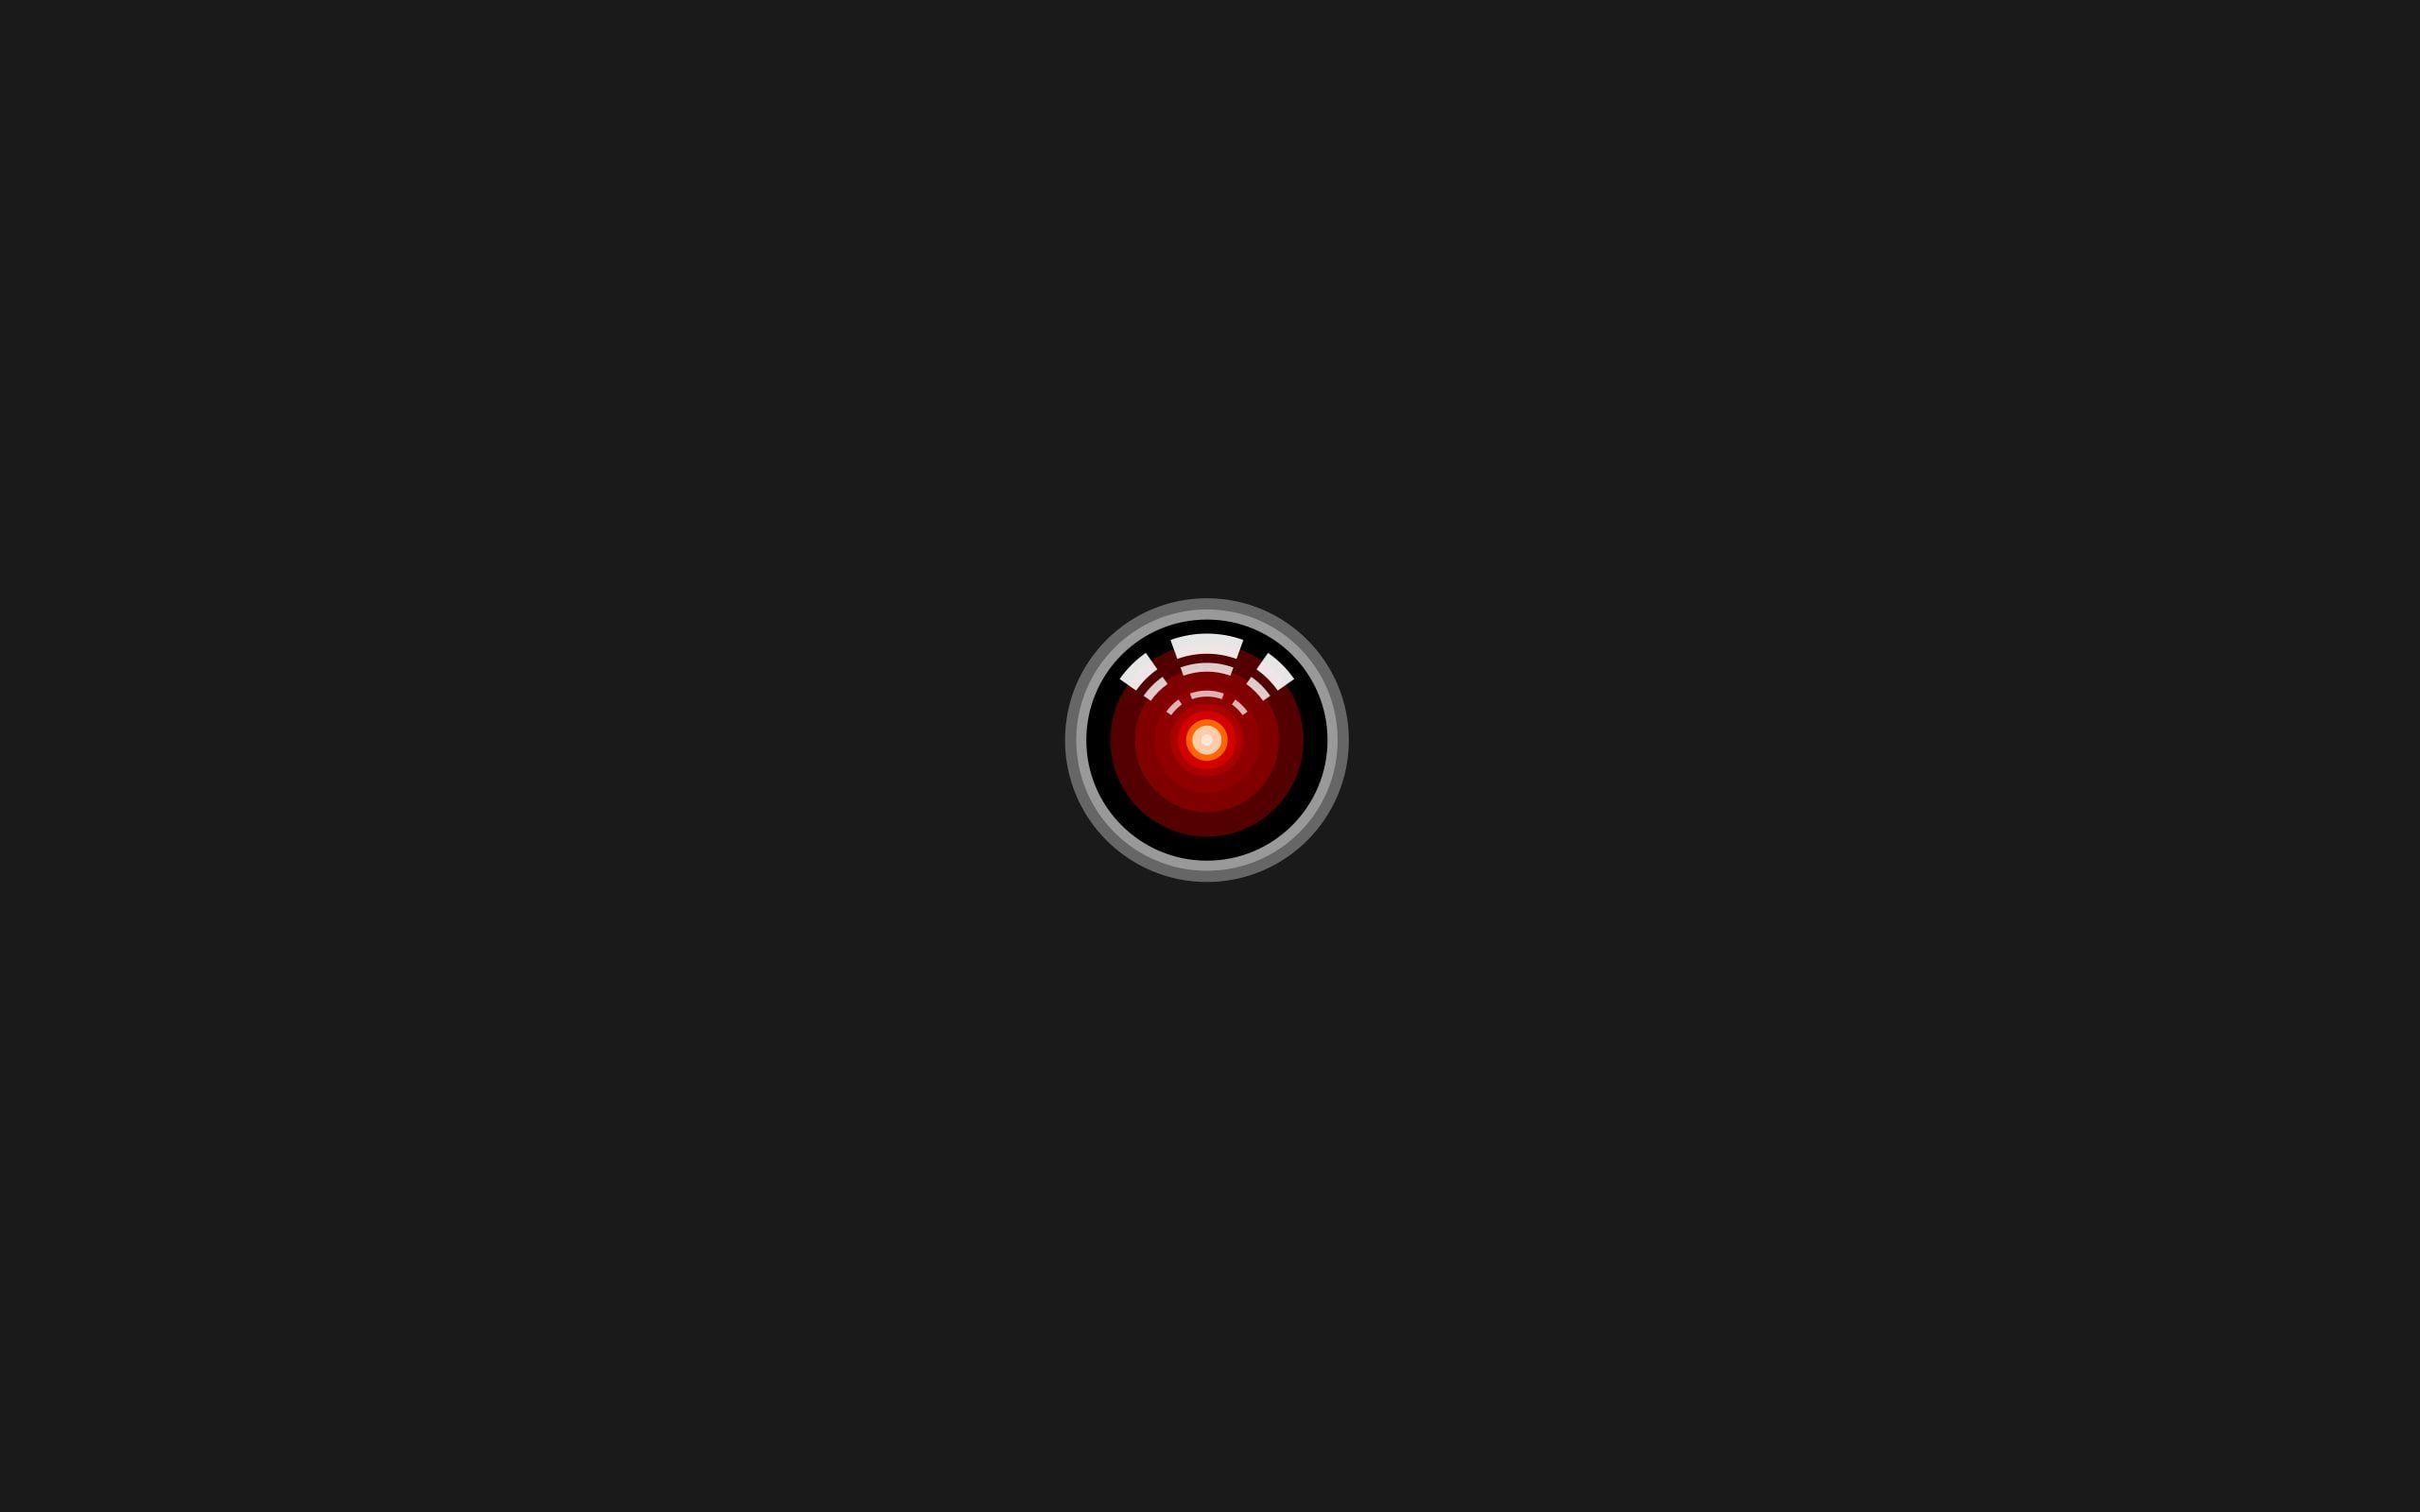 2001 A Space Odyssey Hal 9000 Minimalism Movies Stanley Kubrick 2k Wallpaper Hdwallpaper Desktop Hd Wallpaper Minimalism Movie Latest Hd Wallpapers